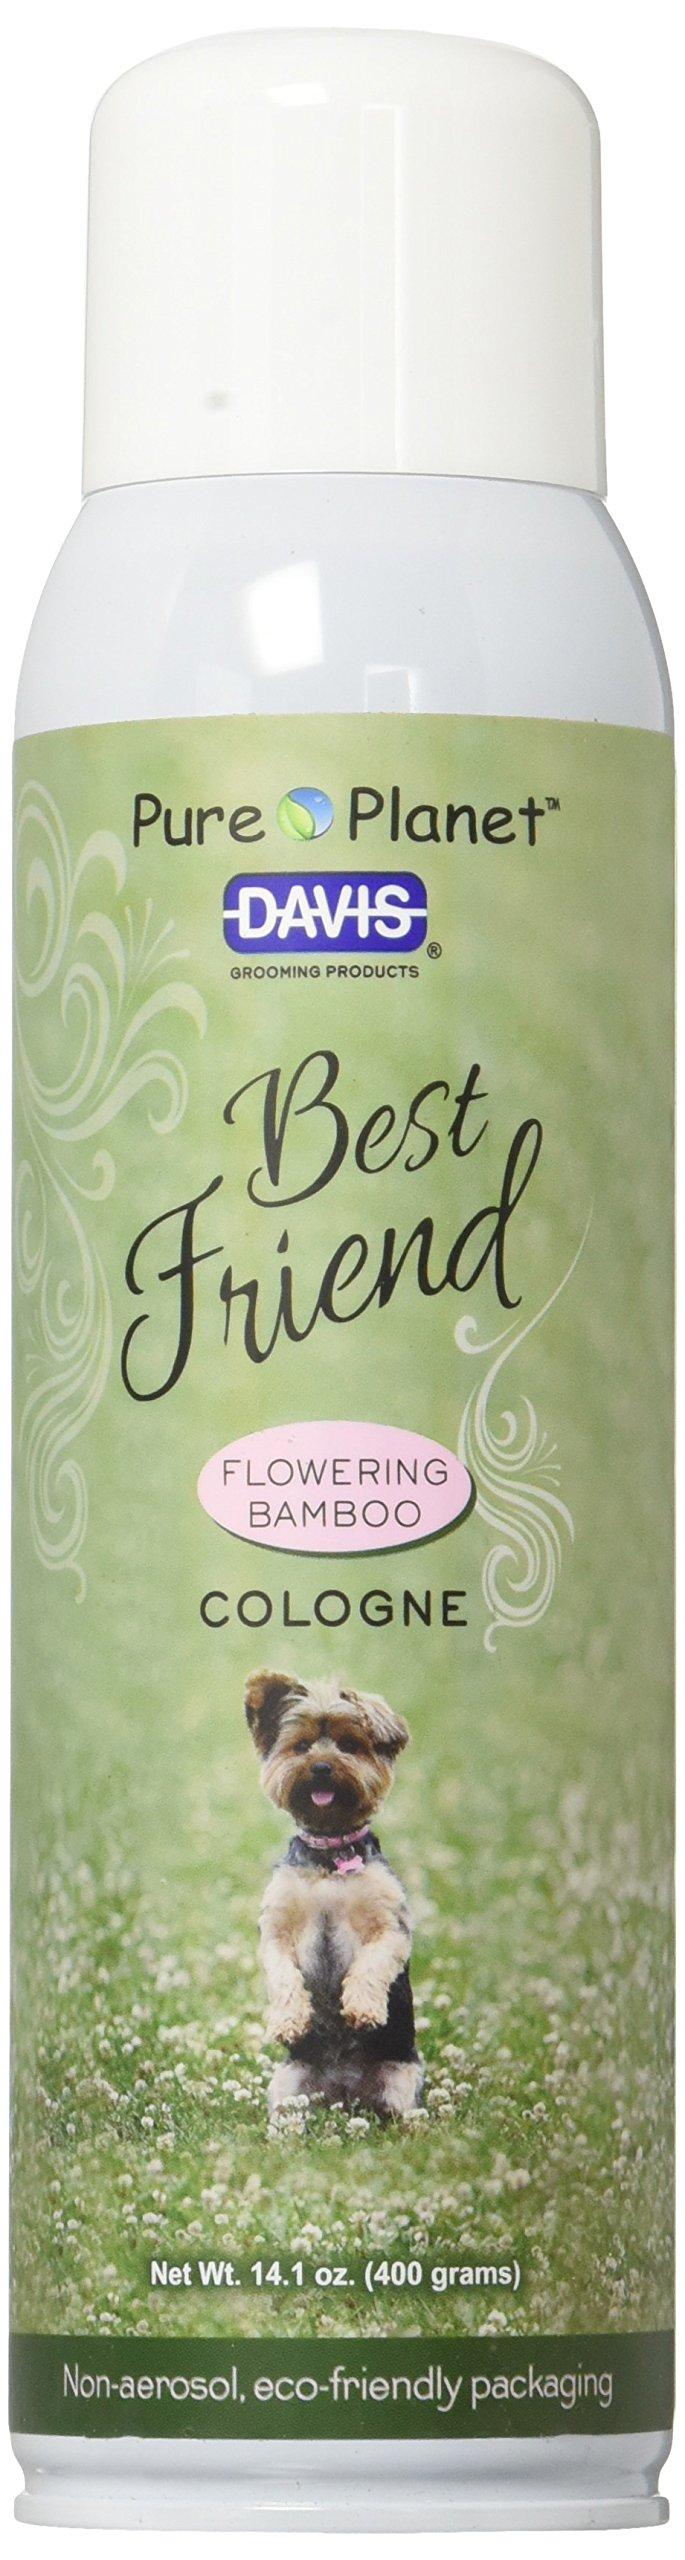 Davis BFC.FB14 Best Friend Flowering Bamboo Pet Cologne, 14.1 oz